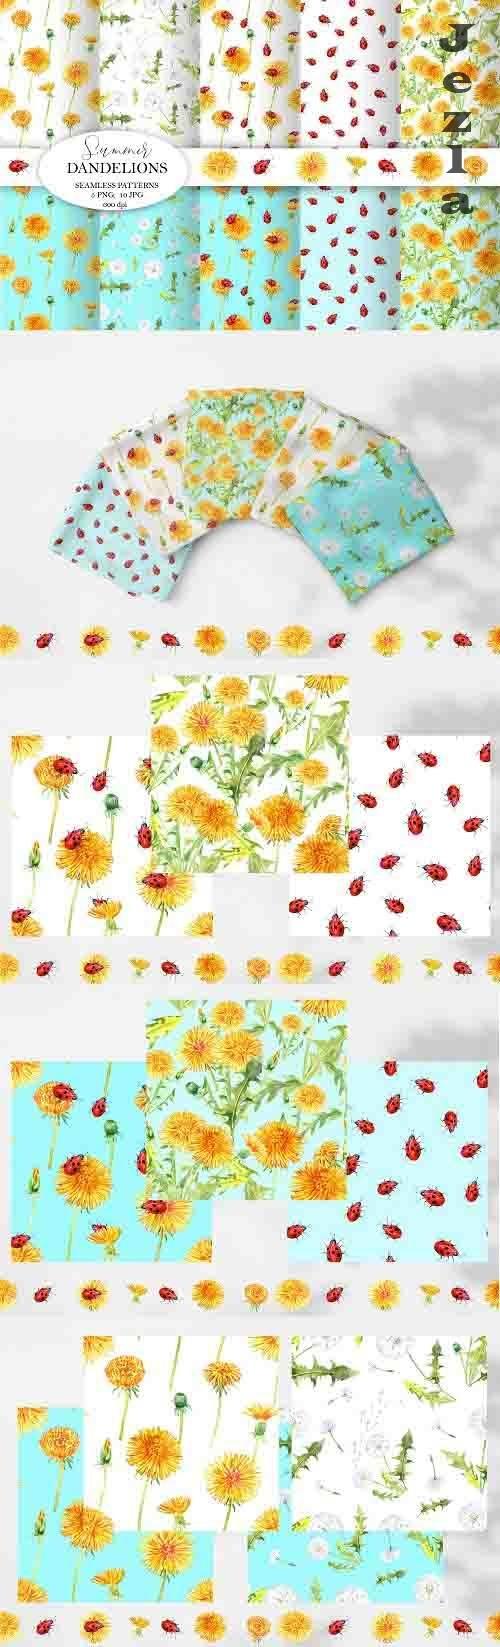 Dandelions Seamless patterns - 1370642